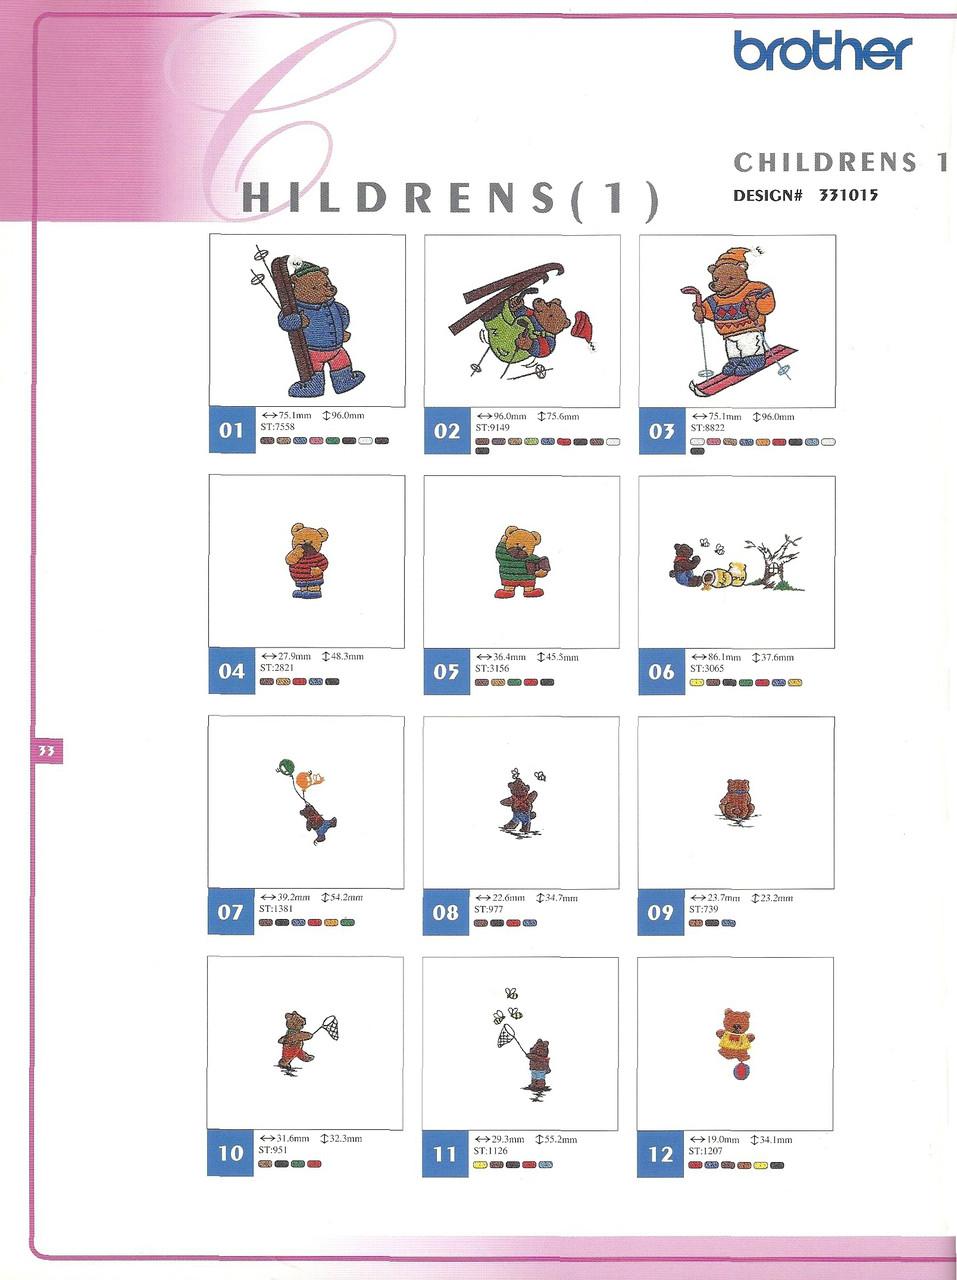 331015 Childrens I